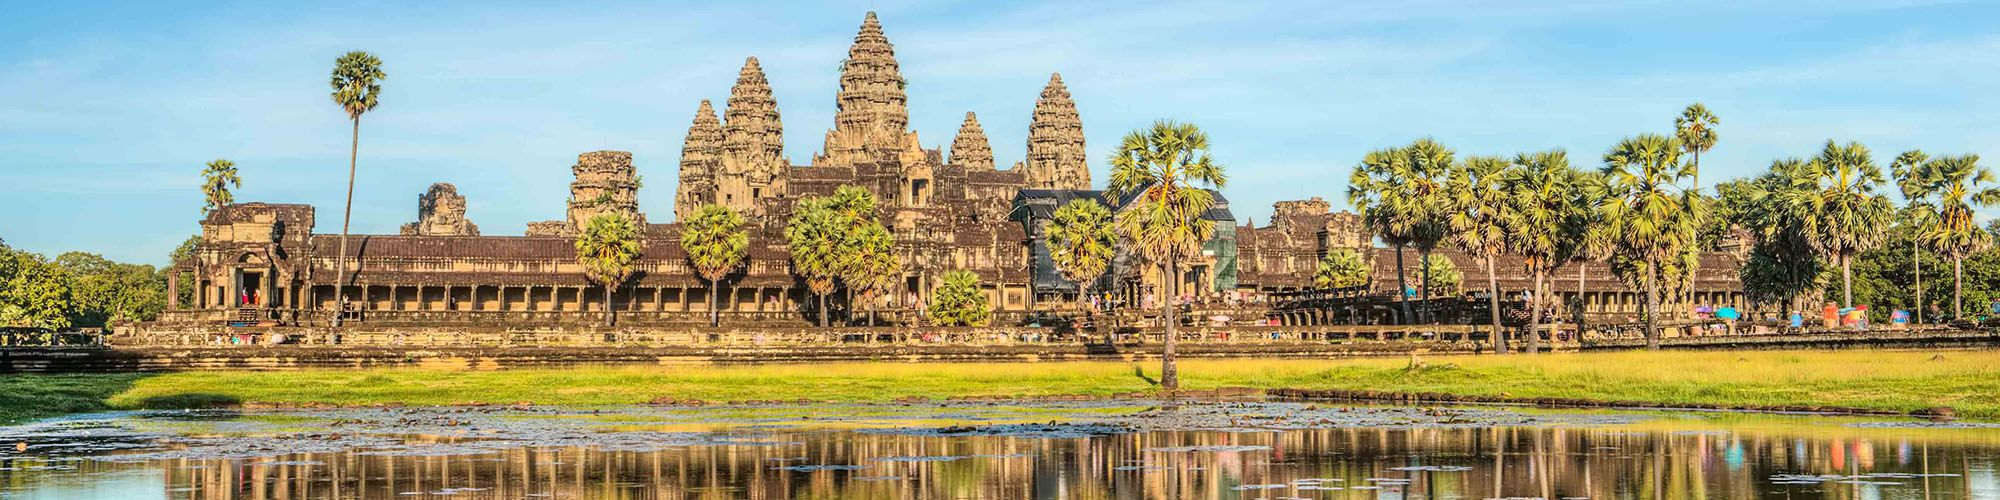 Kambodscha, Angkor Wat, Temple